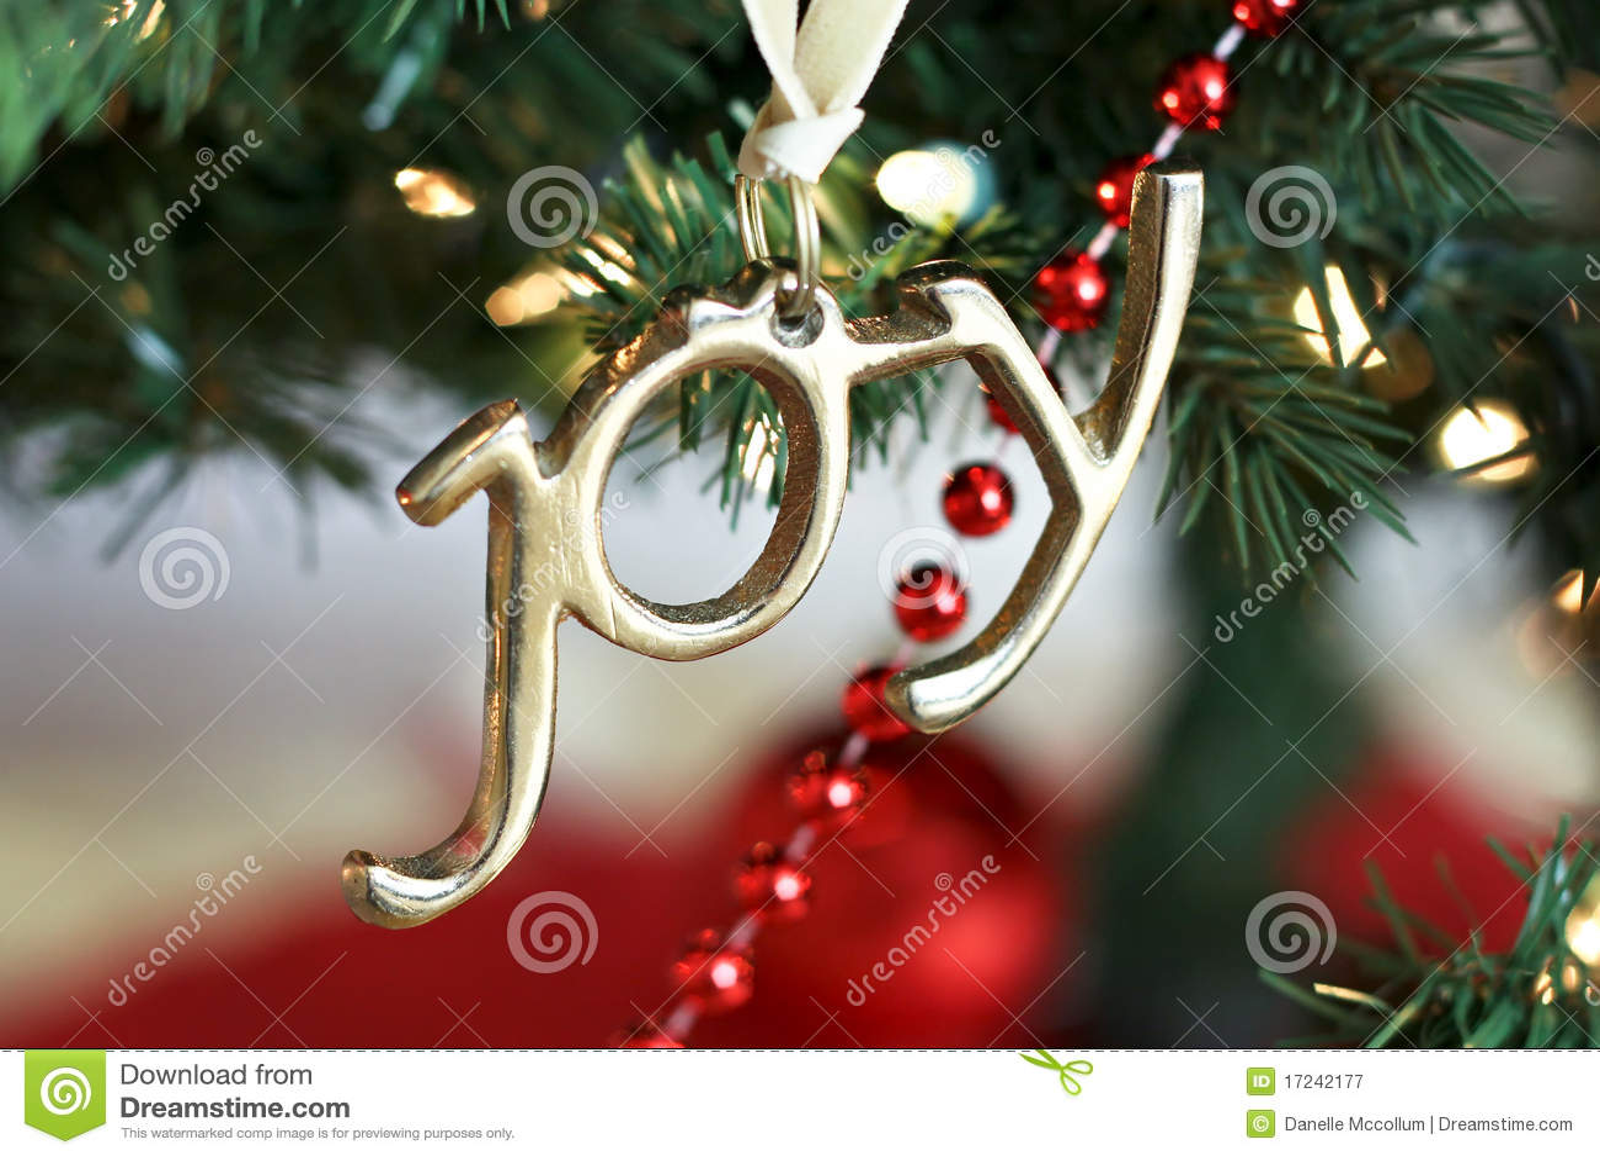 joy christmas ornament royalty free stock photography